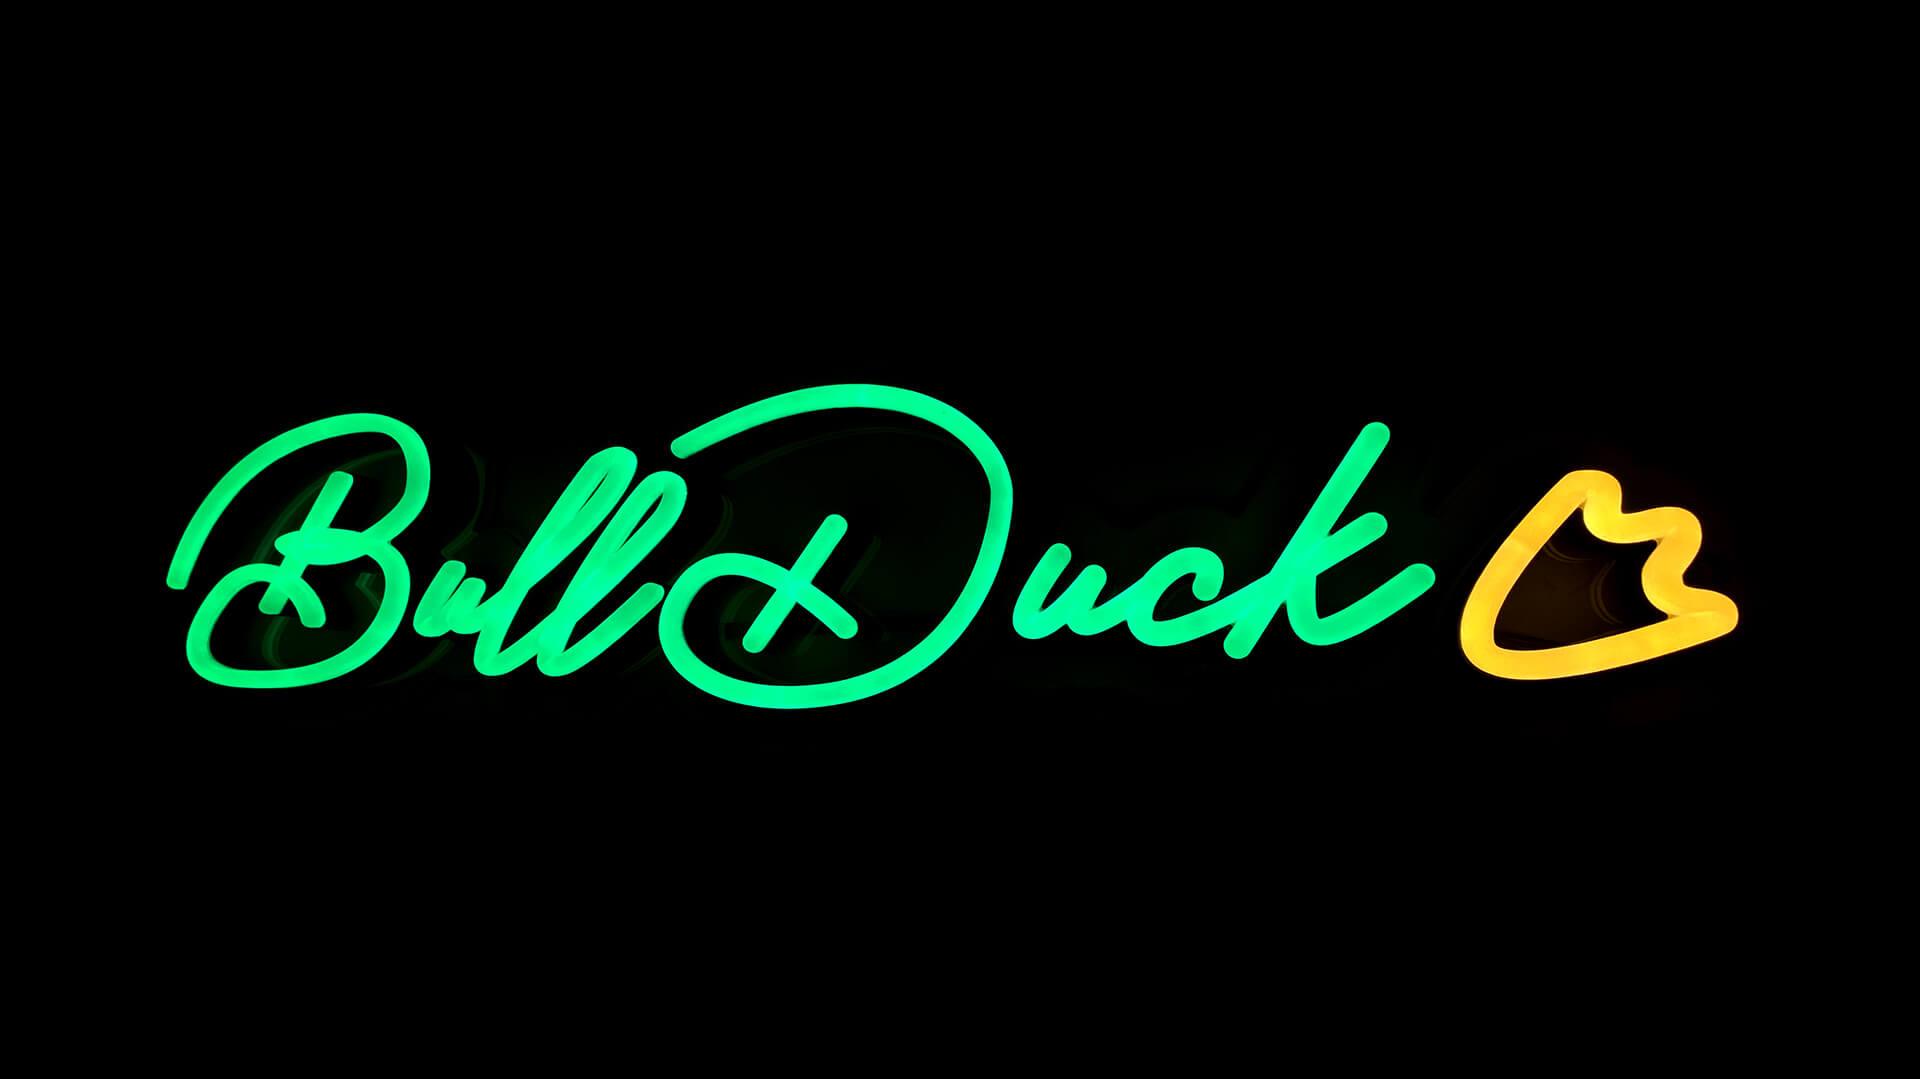 BullDuck's green and yellow neon light